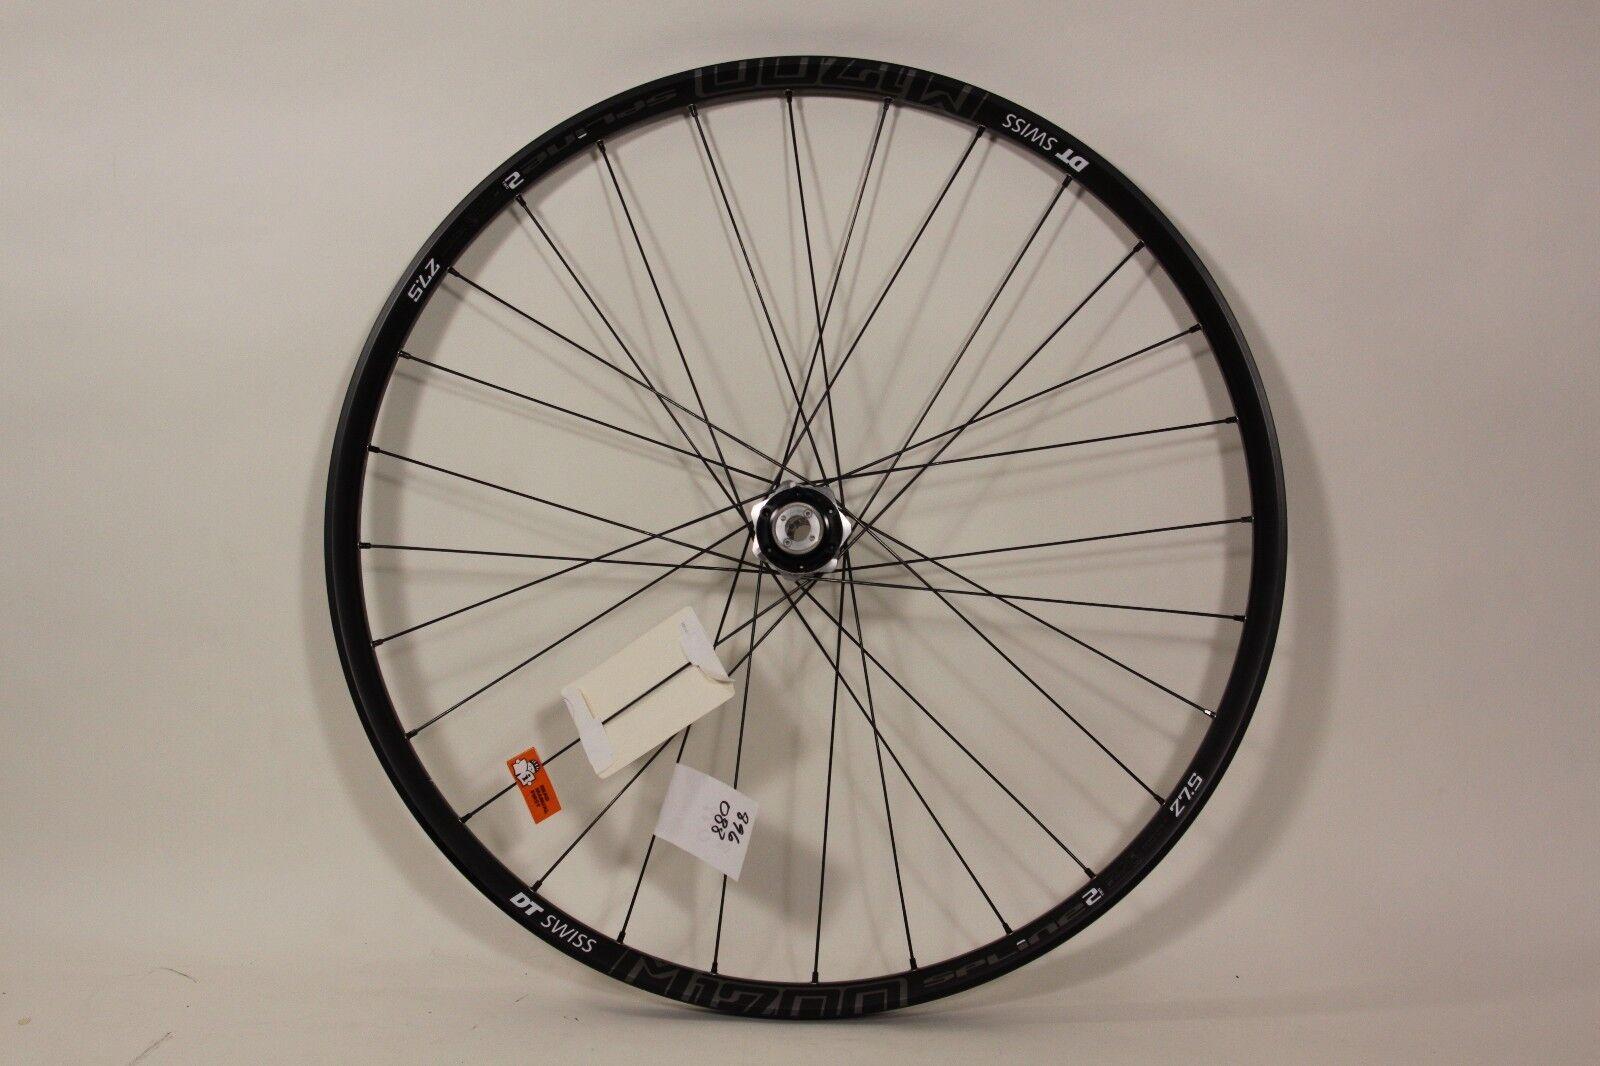 DT Swiss 27.5  Front Wheel M 1700 Spline2 15x110mm Axle 28h 6 bolt Boost 896088